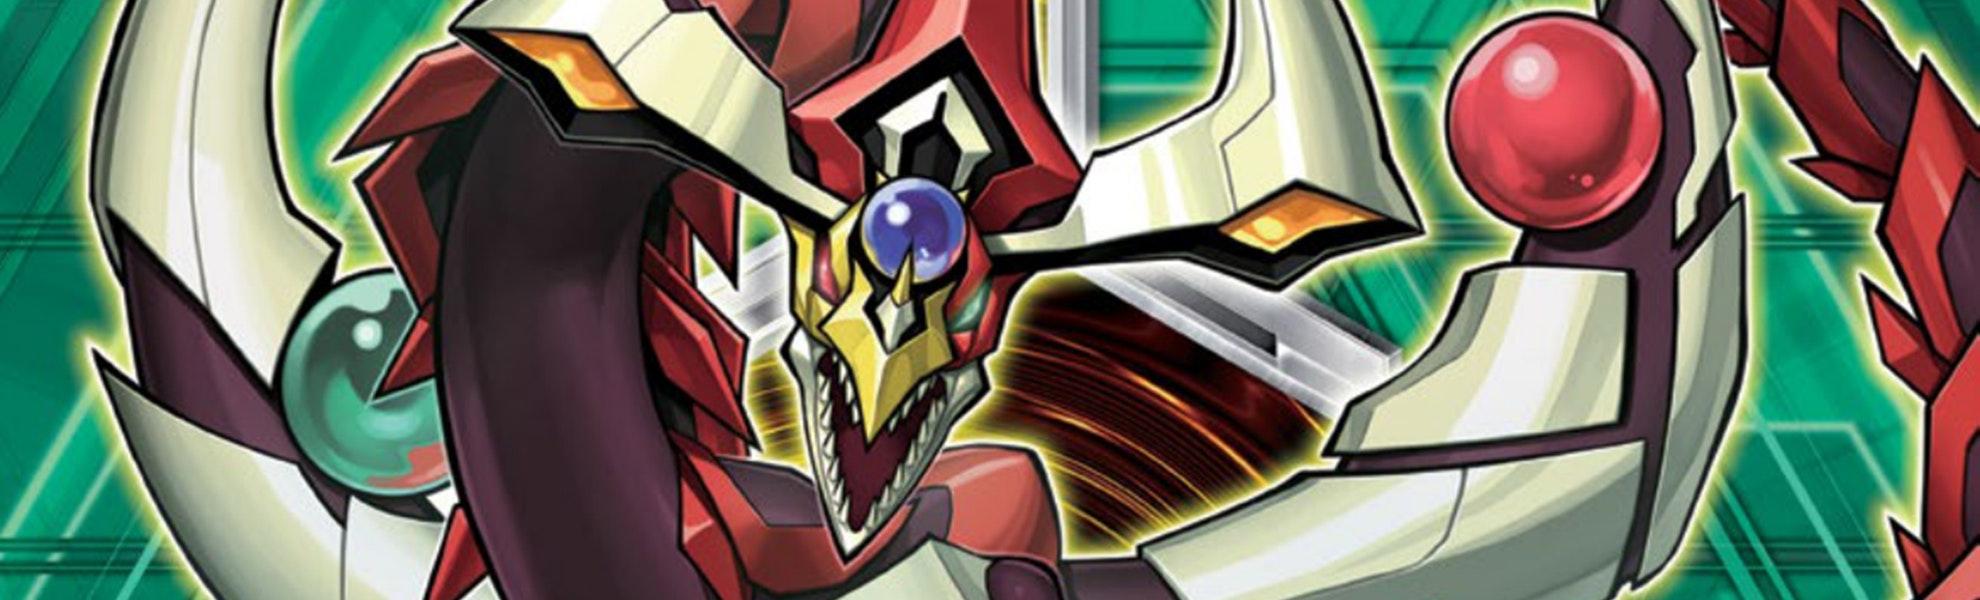 Yu-Gi-Oh Duelist Alliance Booster Box